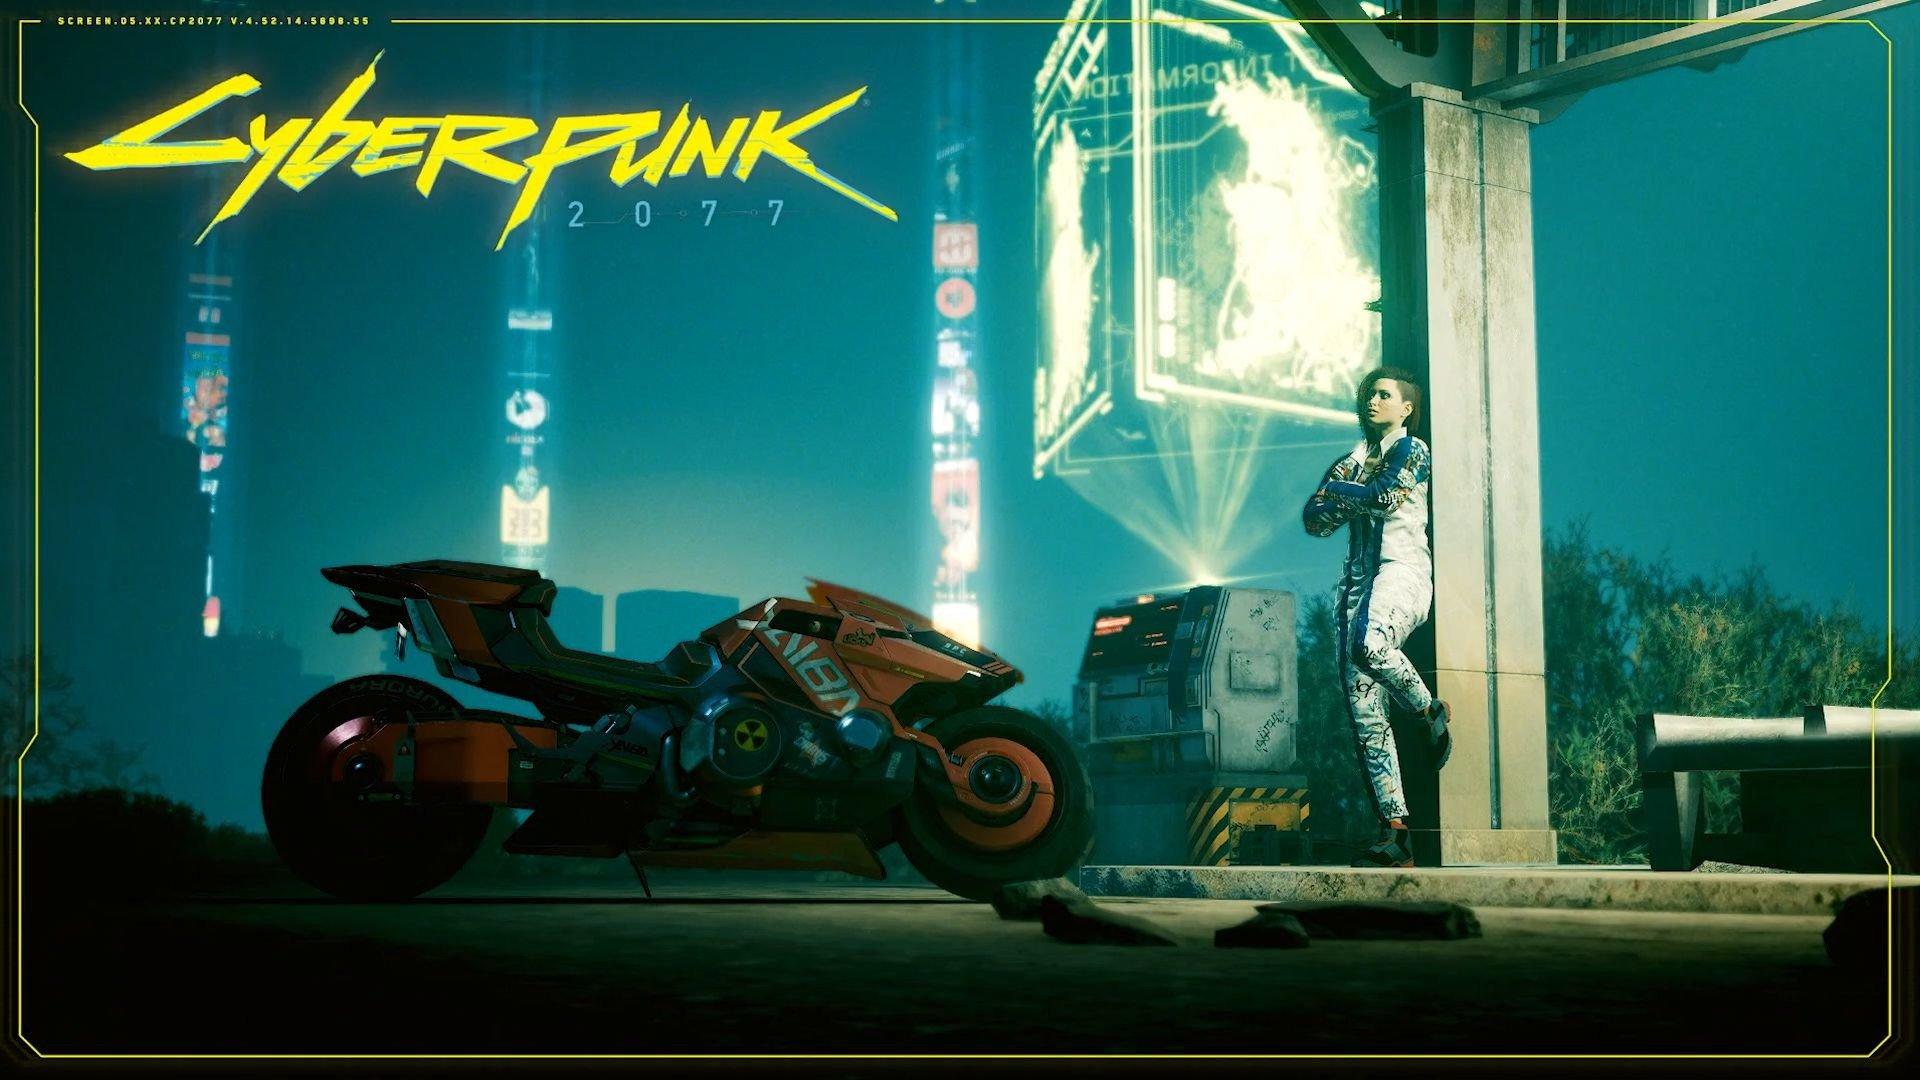 Trailer, Rollenspiel, Fotos, CD Projekt RED, Cyberpunk 2077, CD Projekt, Cyberpunk, Foto-Modus